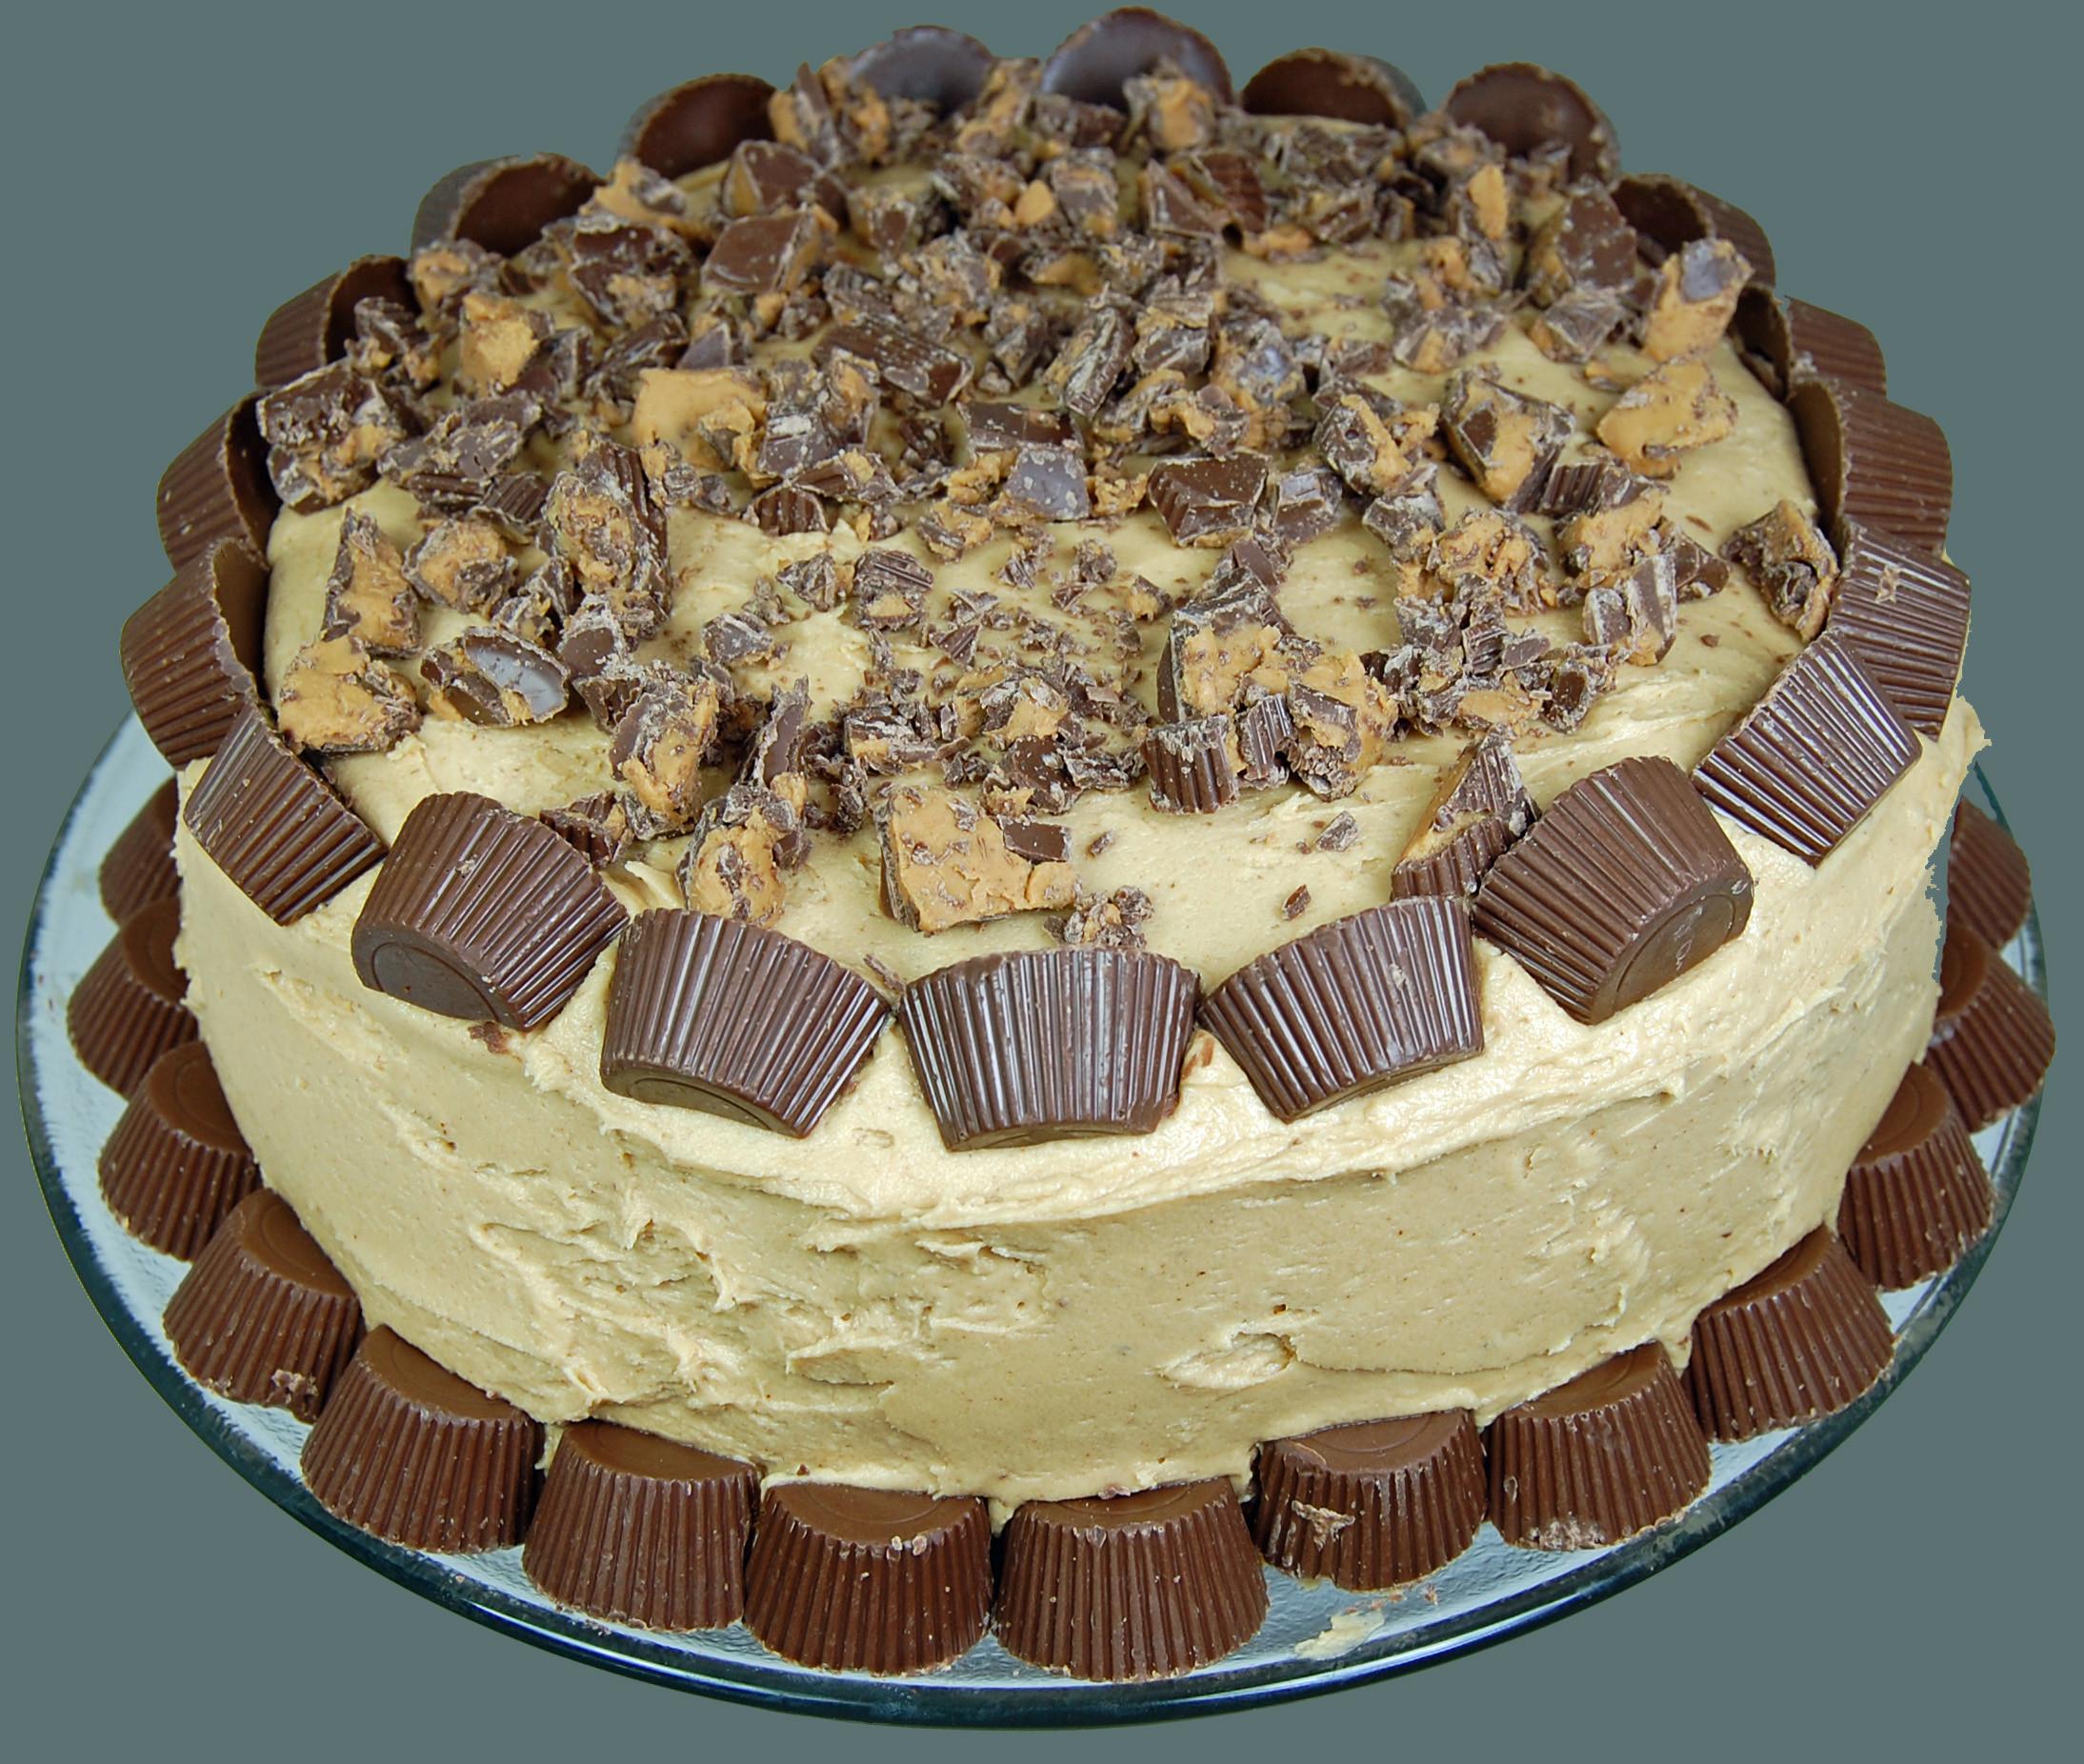 Chocolate Peanut Butter Cake Recipe  Chocolate Peanut Butter Cake